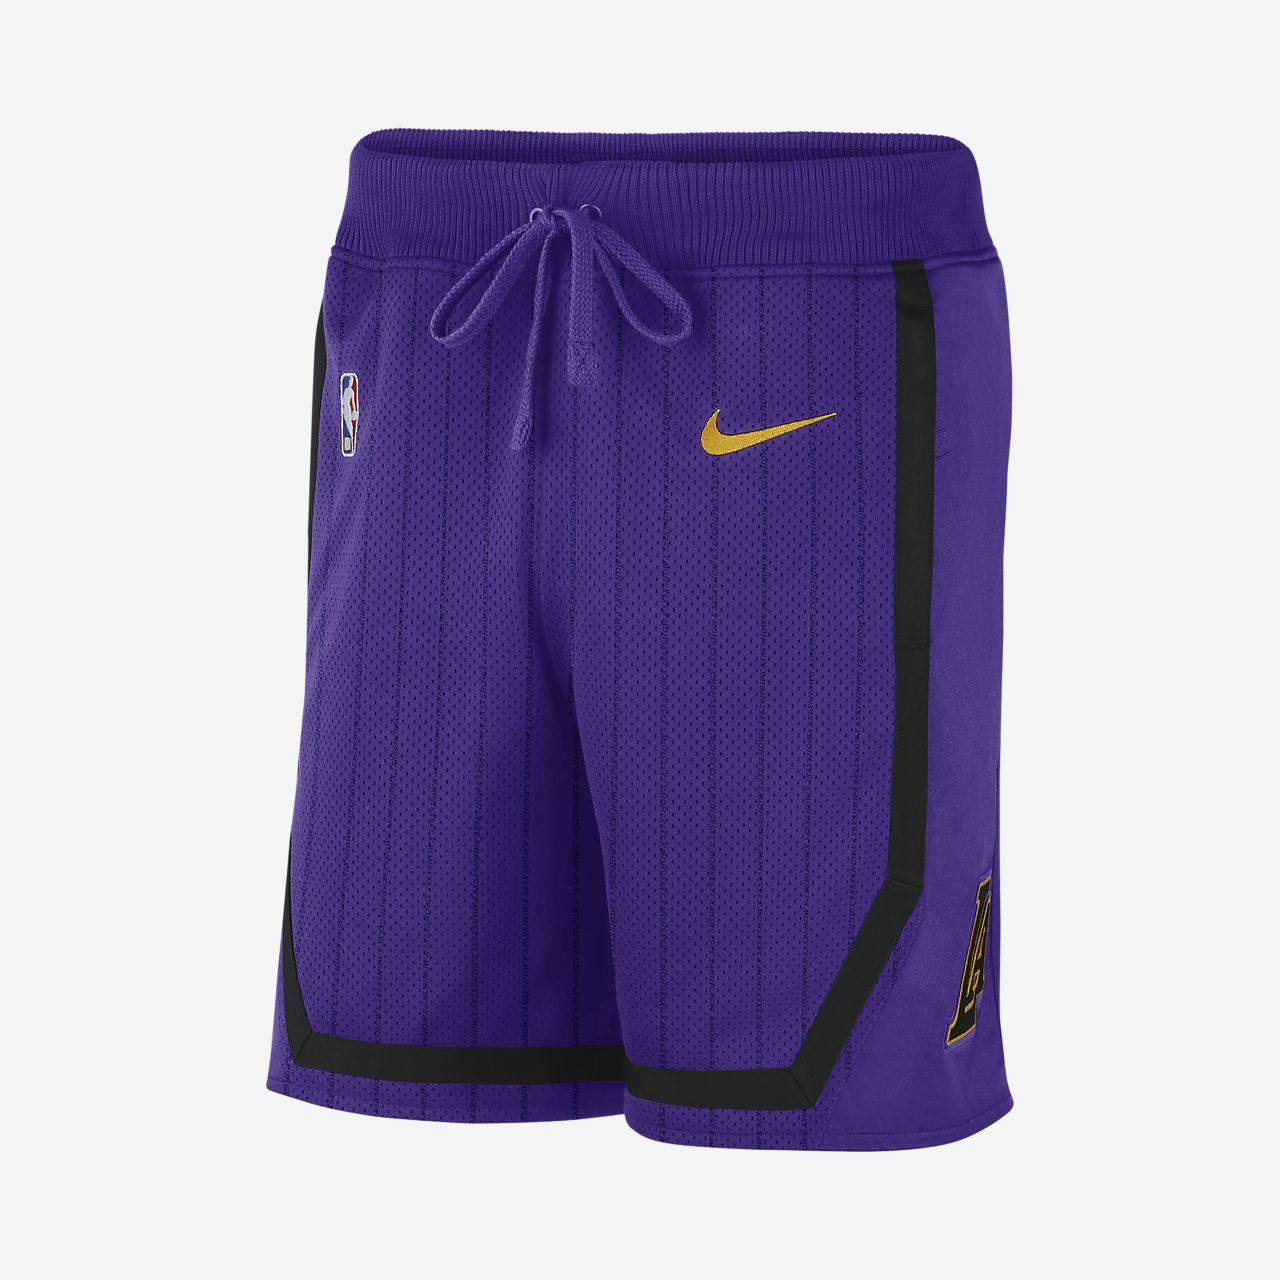 Los Angeles Lakers Nike Courtside Pantalón corto de la NBA - Hombre ... 3c4983b1f034b